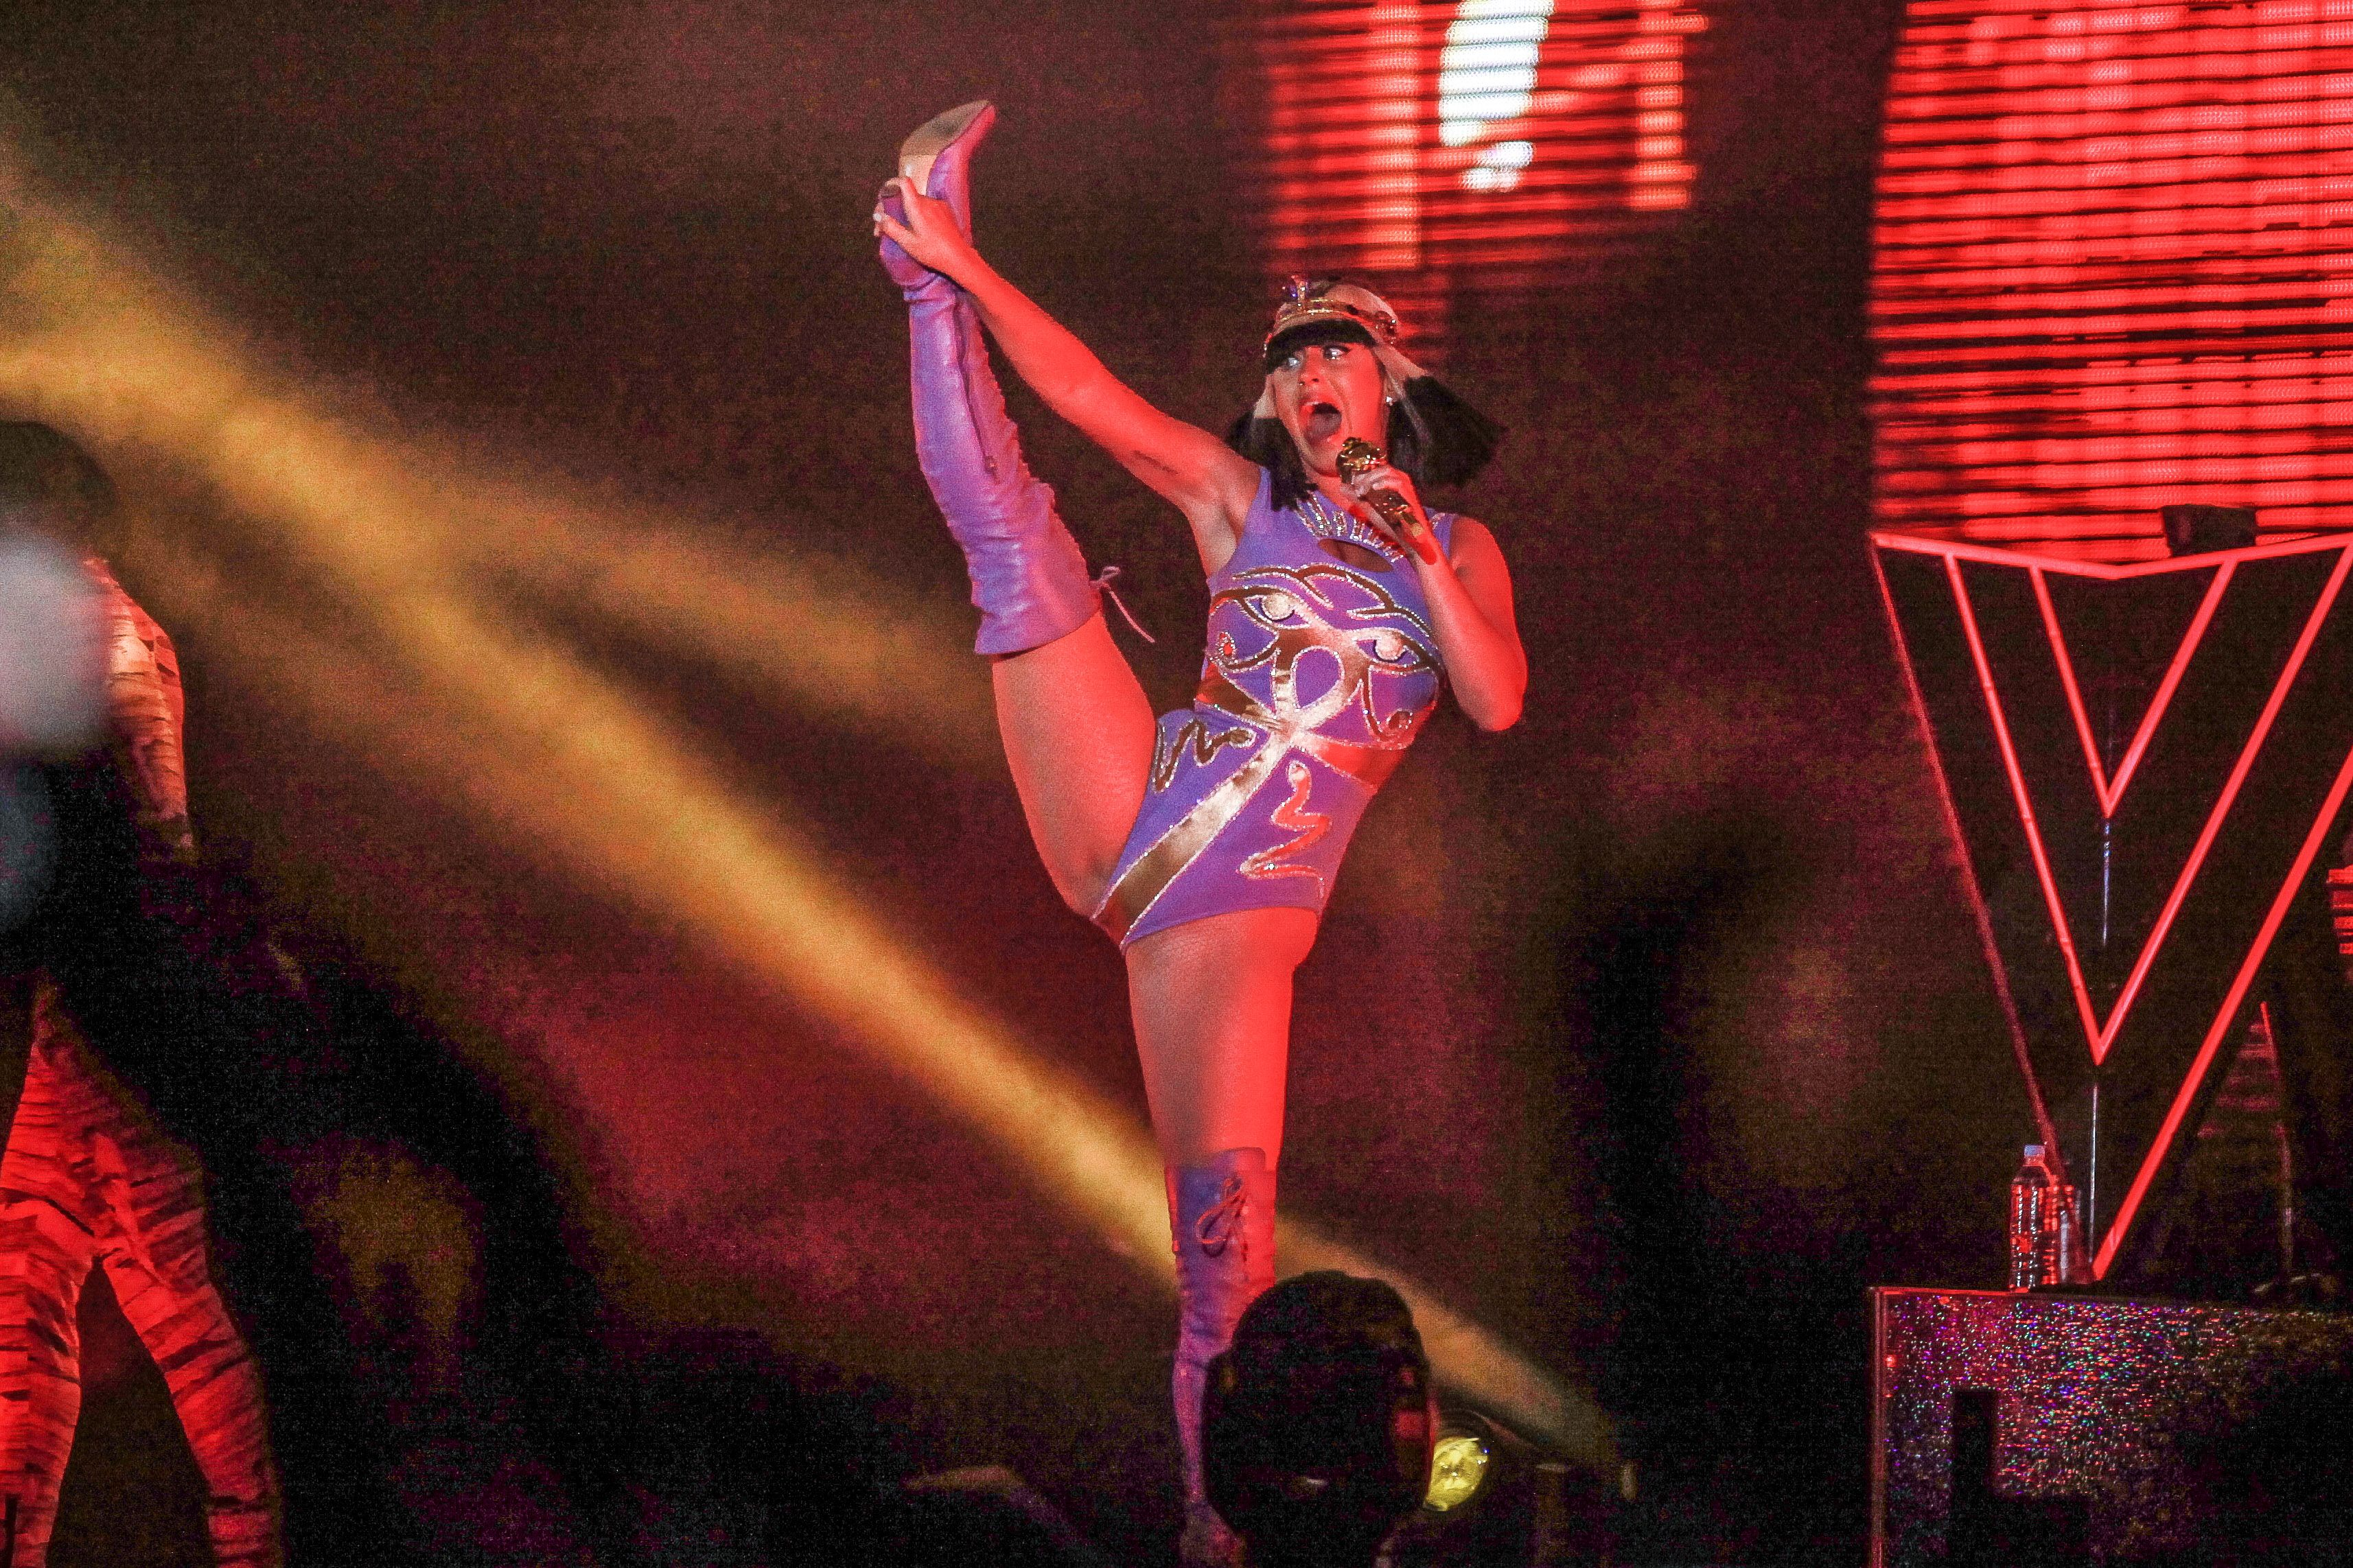 Katy-Perry-Sexy-1 (1)